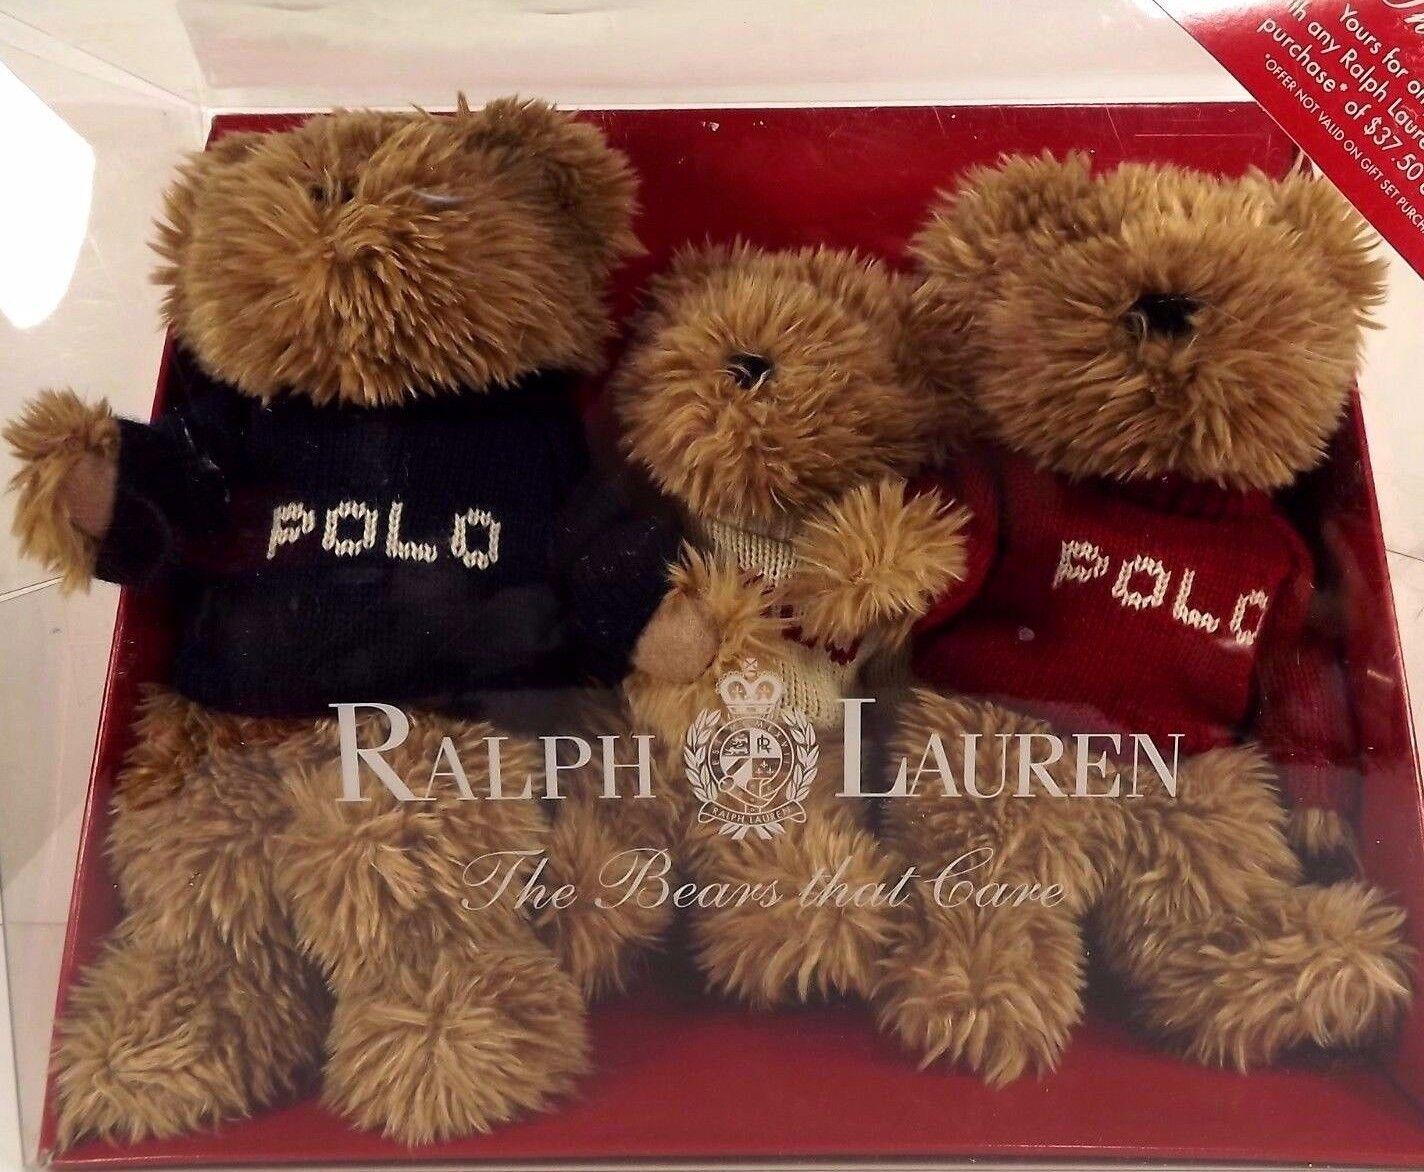 Ralph Lauren Bears That Care Polo Teddy Set 2002 Sweaters 3 Sizes marrone Plush